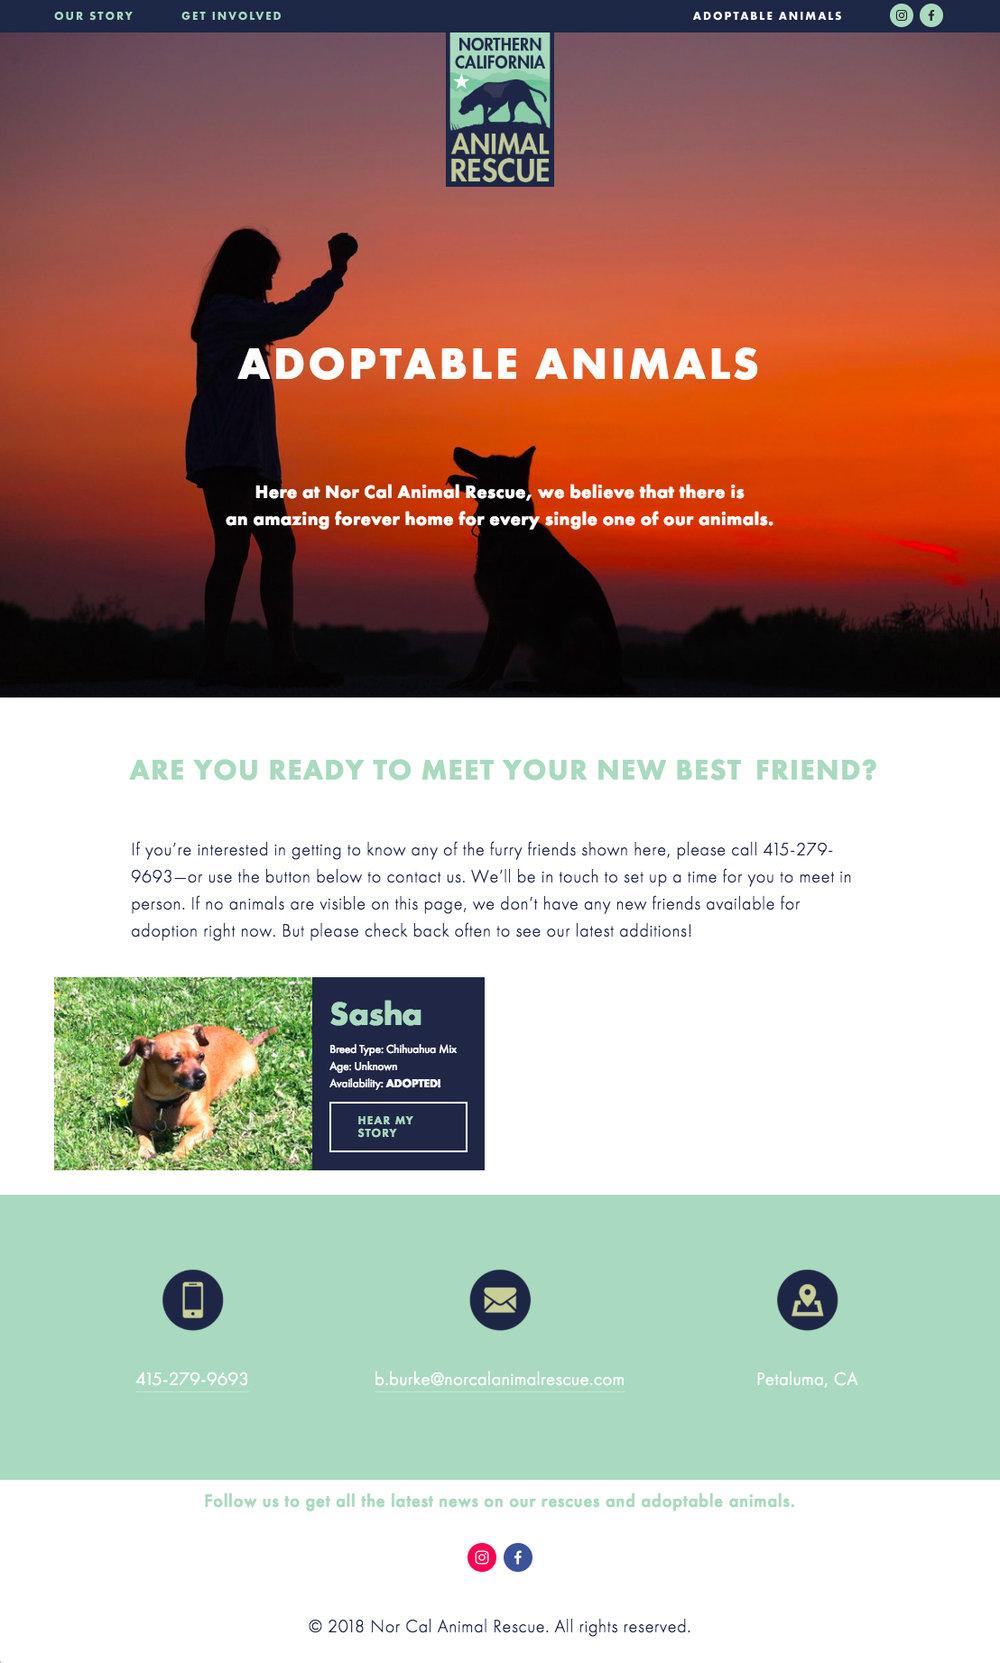 NCAR_Adopt.jpg